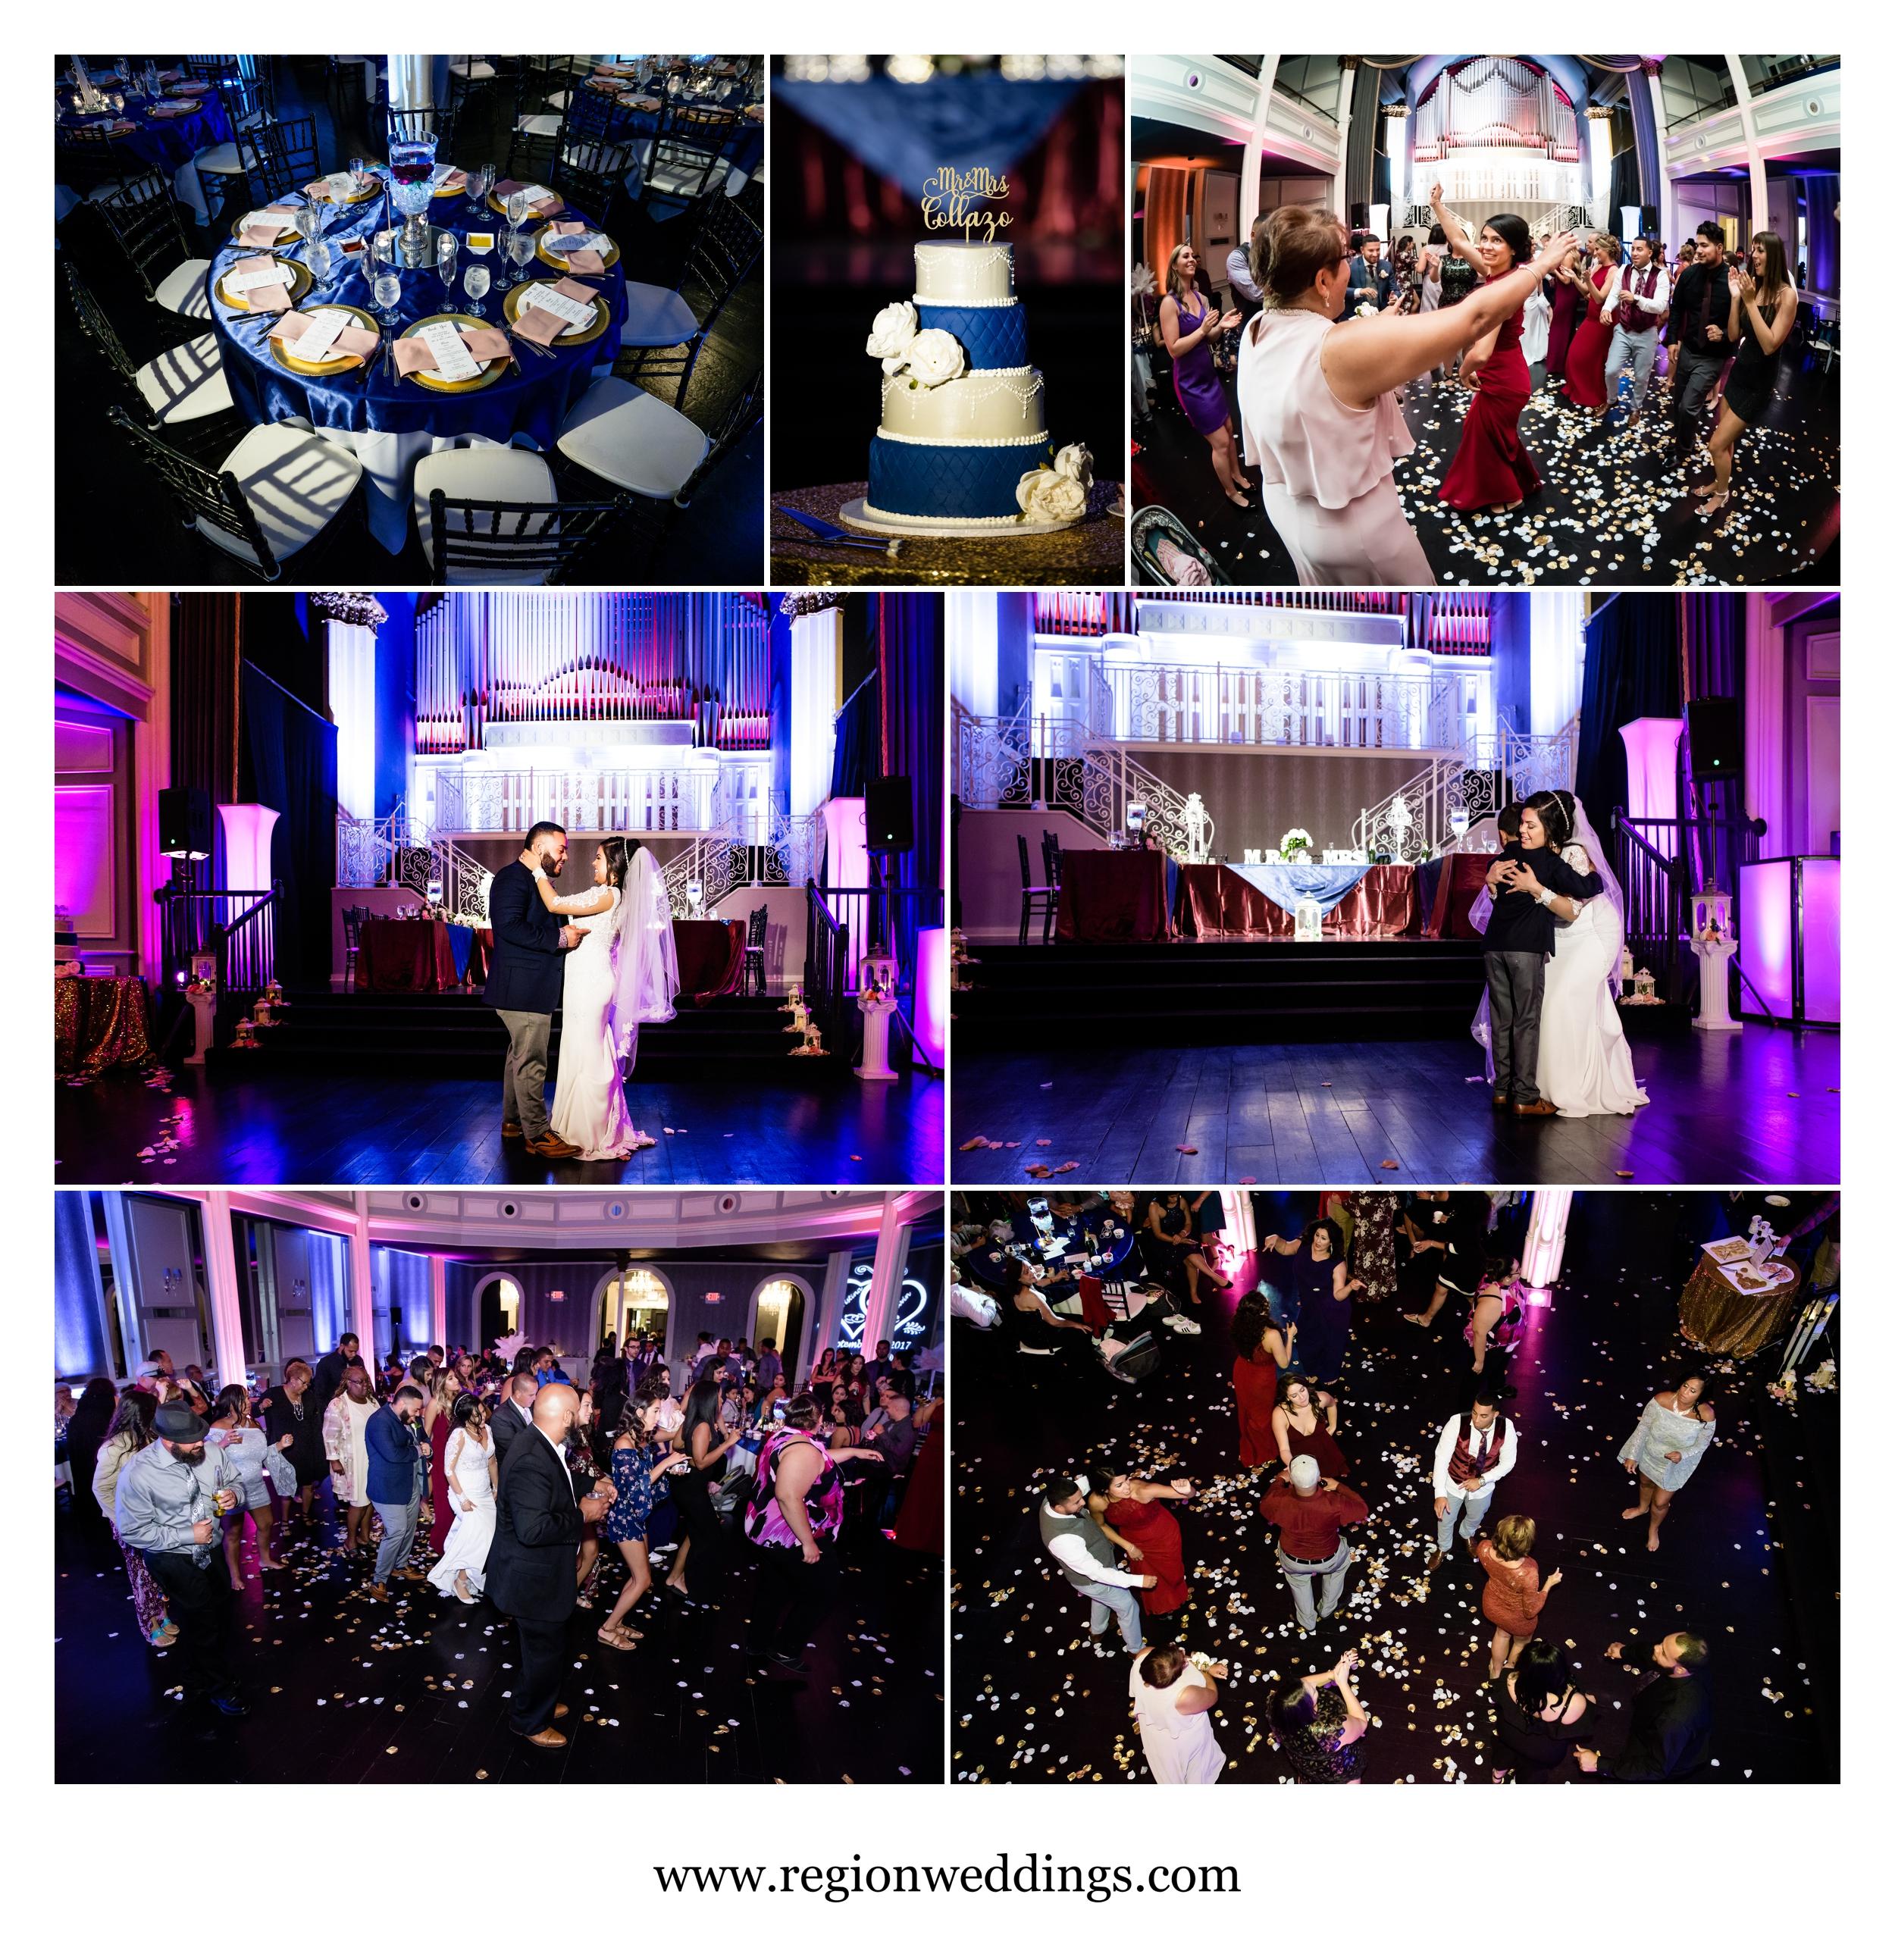 Wedding reception photos at The Uptown Center.